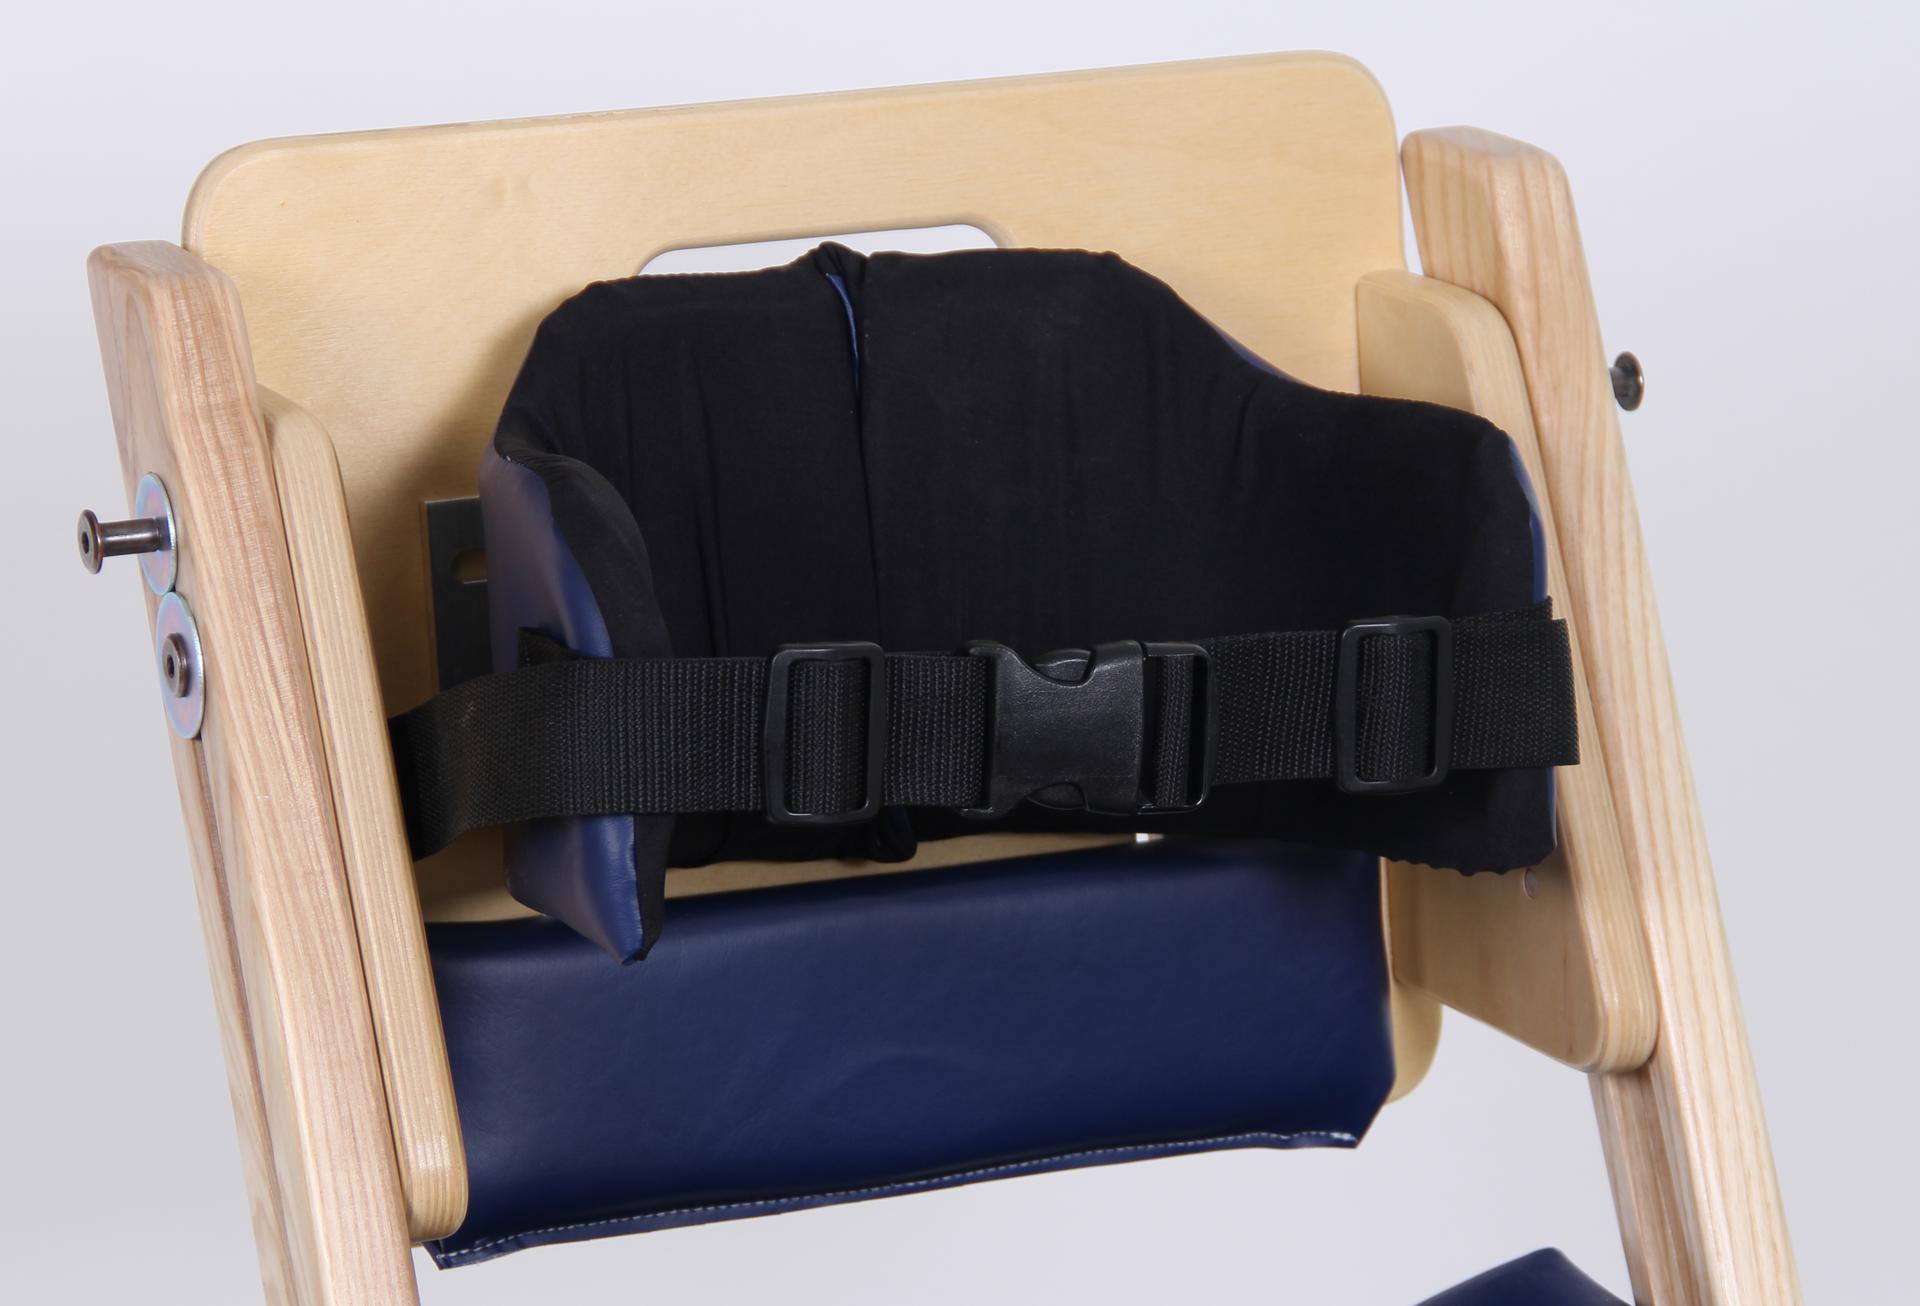 Thoracic belt